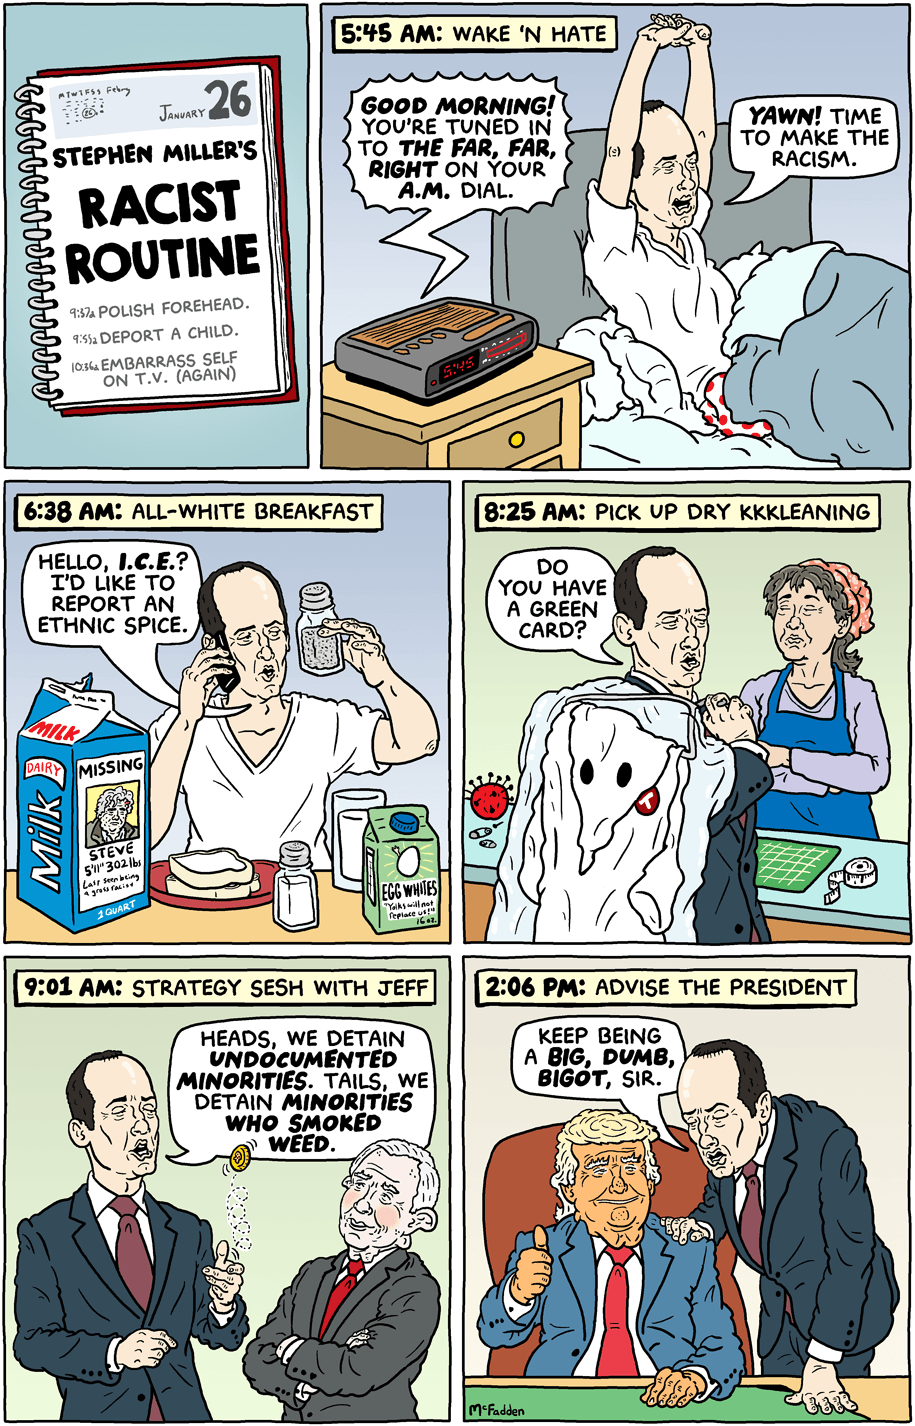 Cartoon: Stephen Miller's racist routine